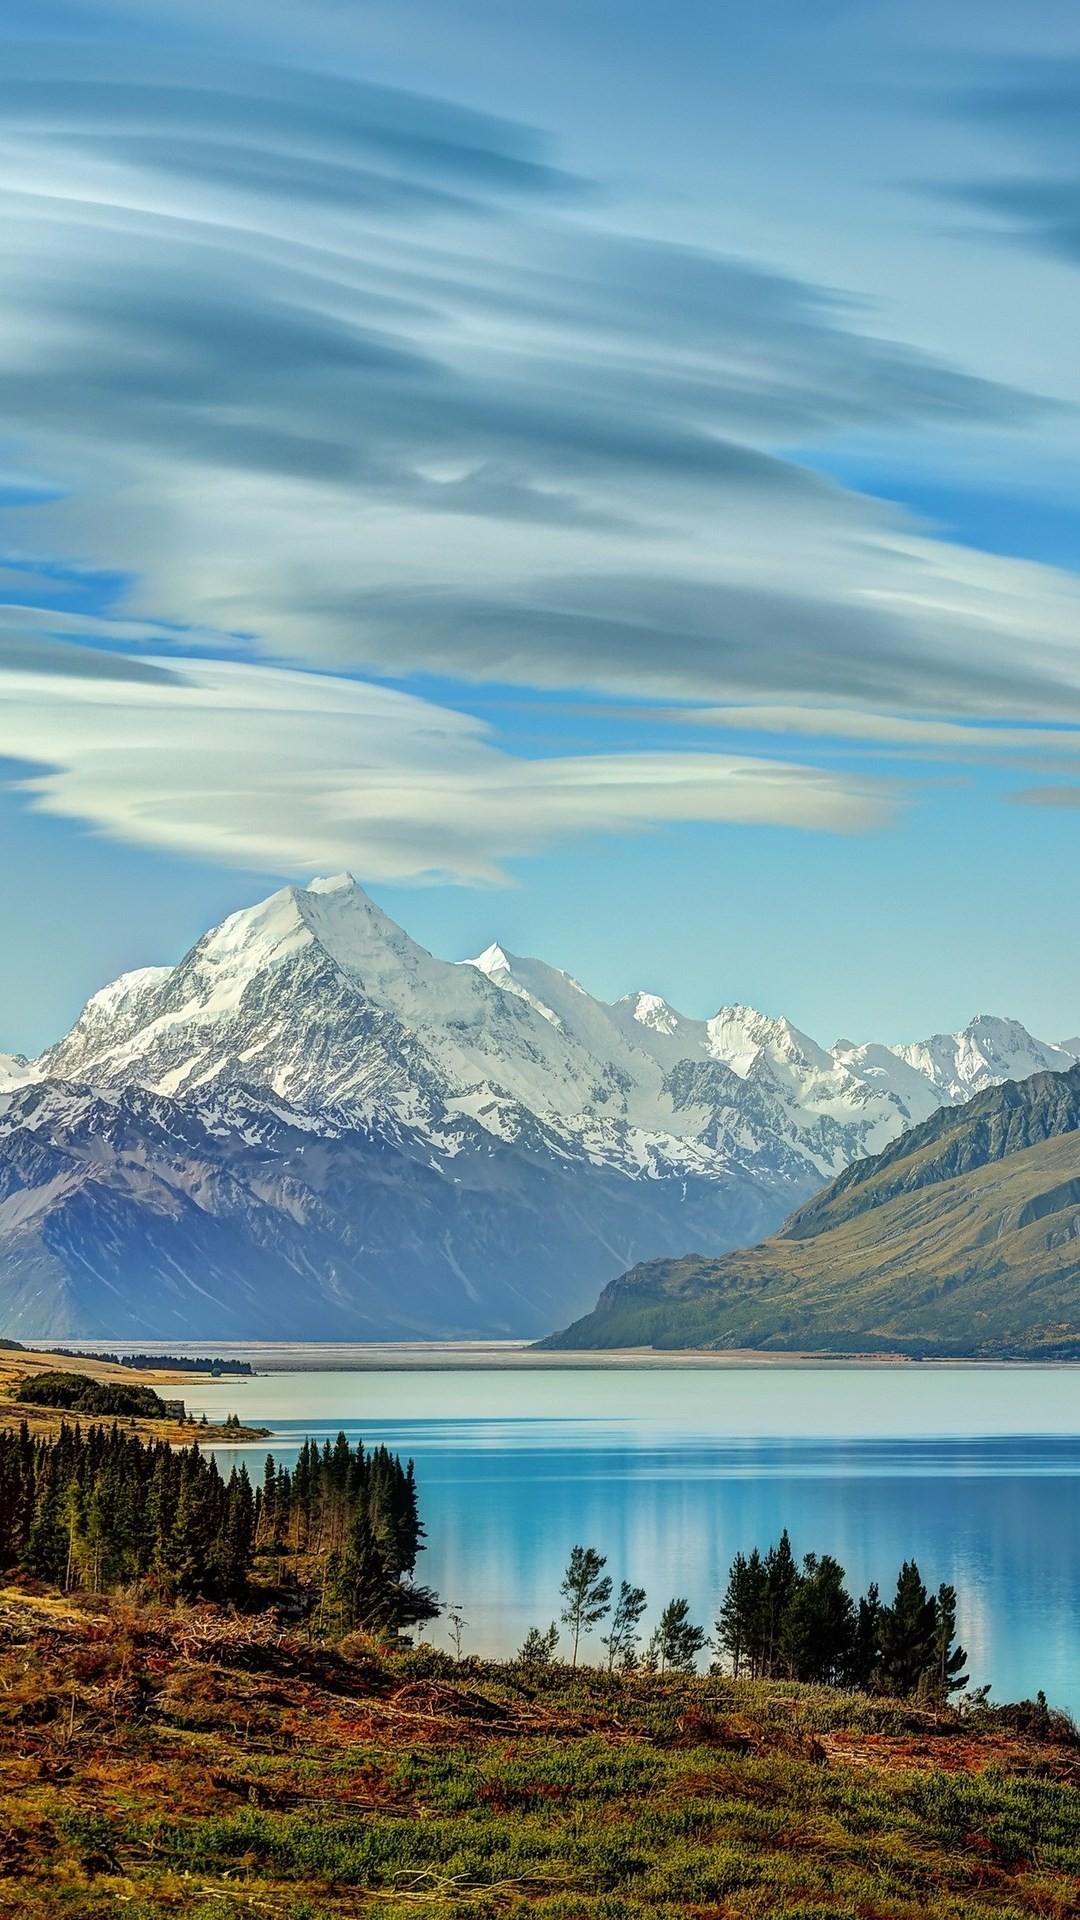 C9 Iphone Wallpaper Beautiful Lake New Zealand Of Wallpaper 1080x1920